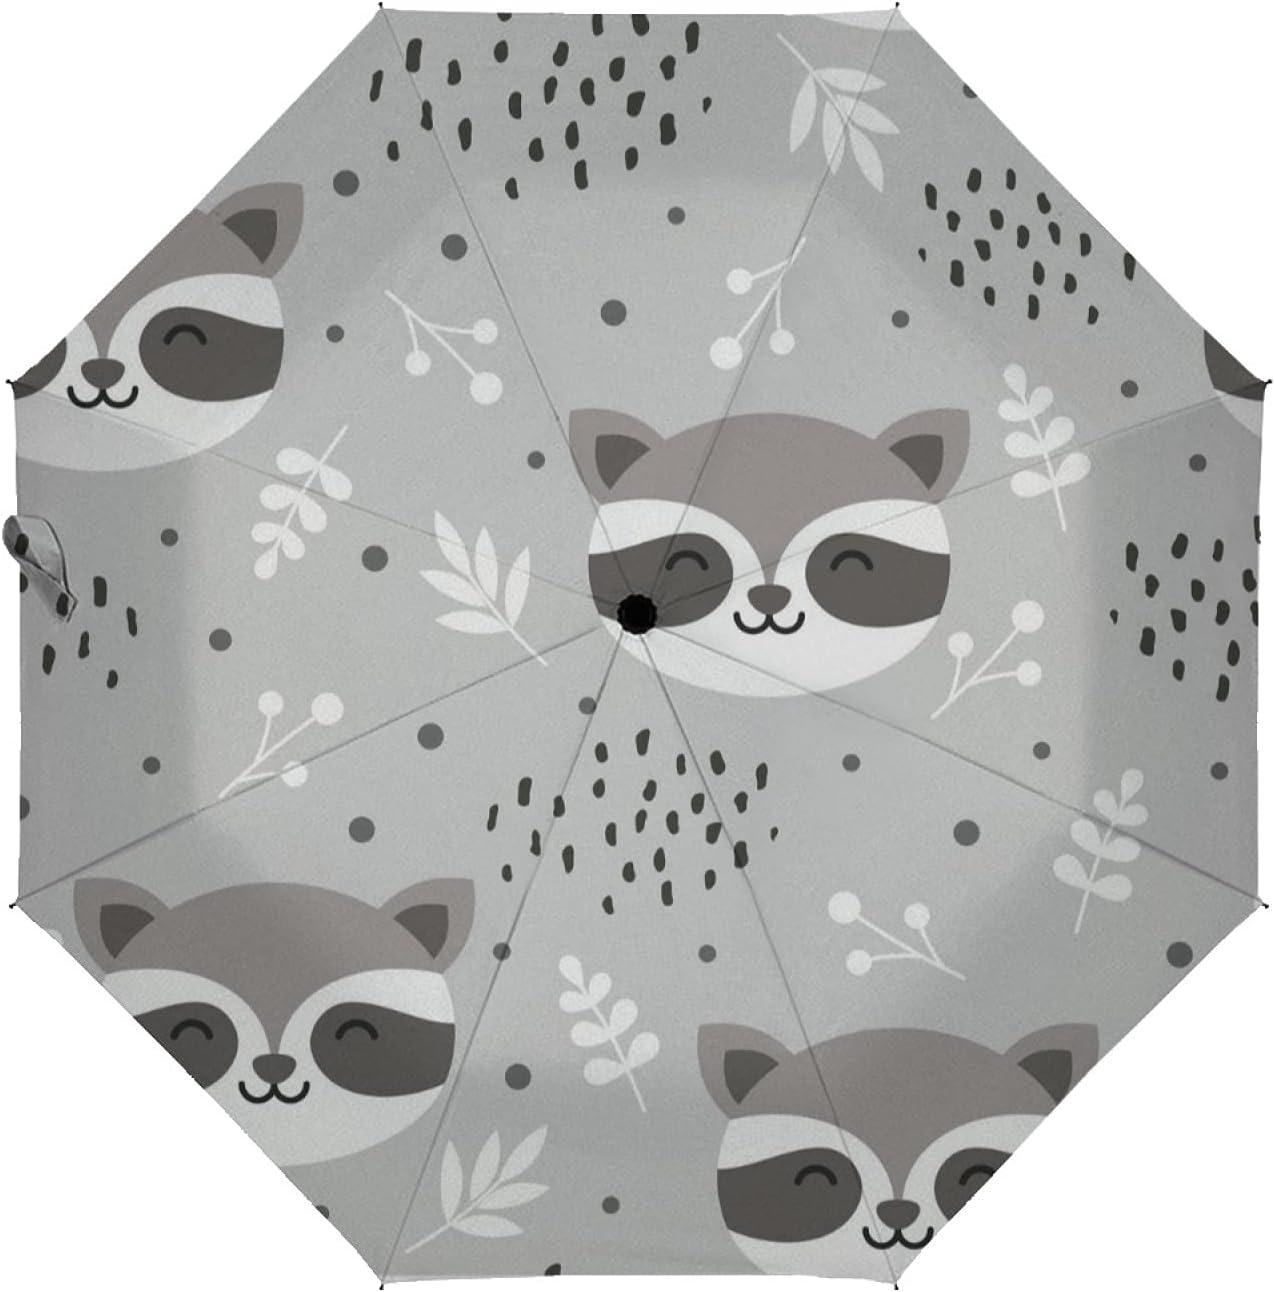 Regular discount ZXZNC Compact Umbrella Sunflower and Cats Aut Ranking TOP5 Cute Animal Kitten